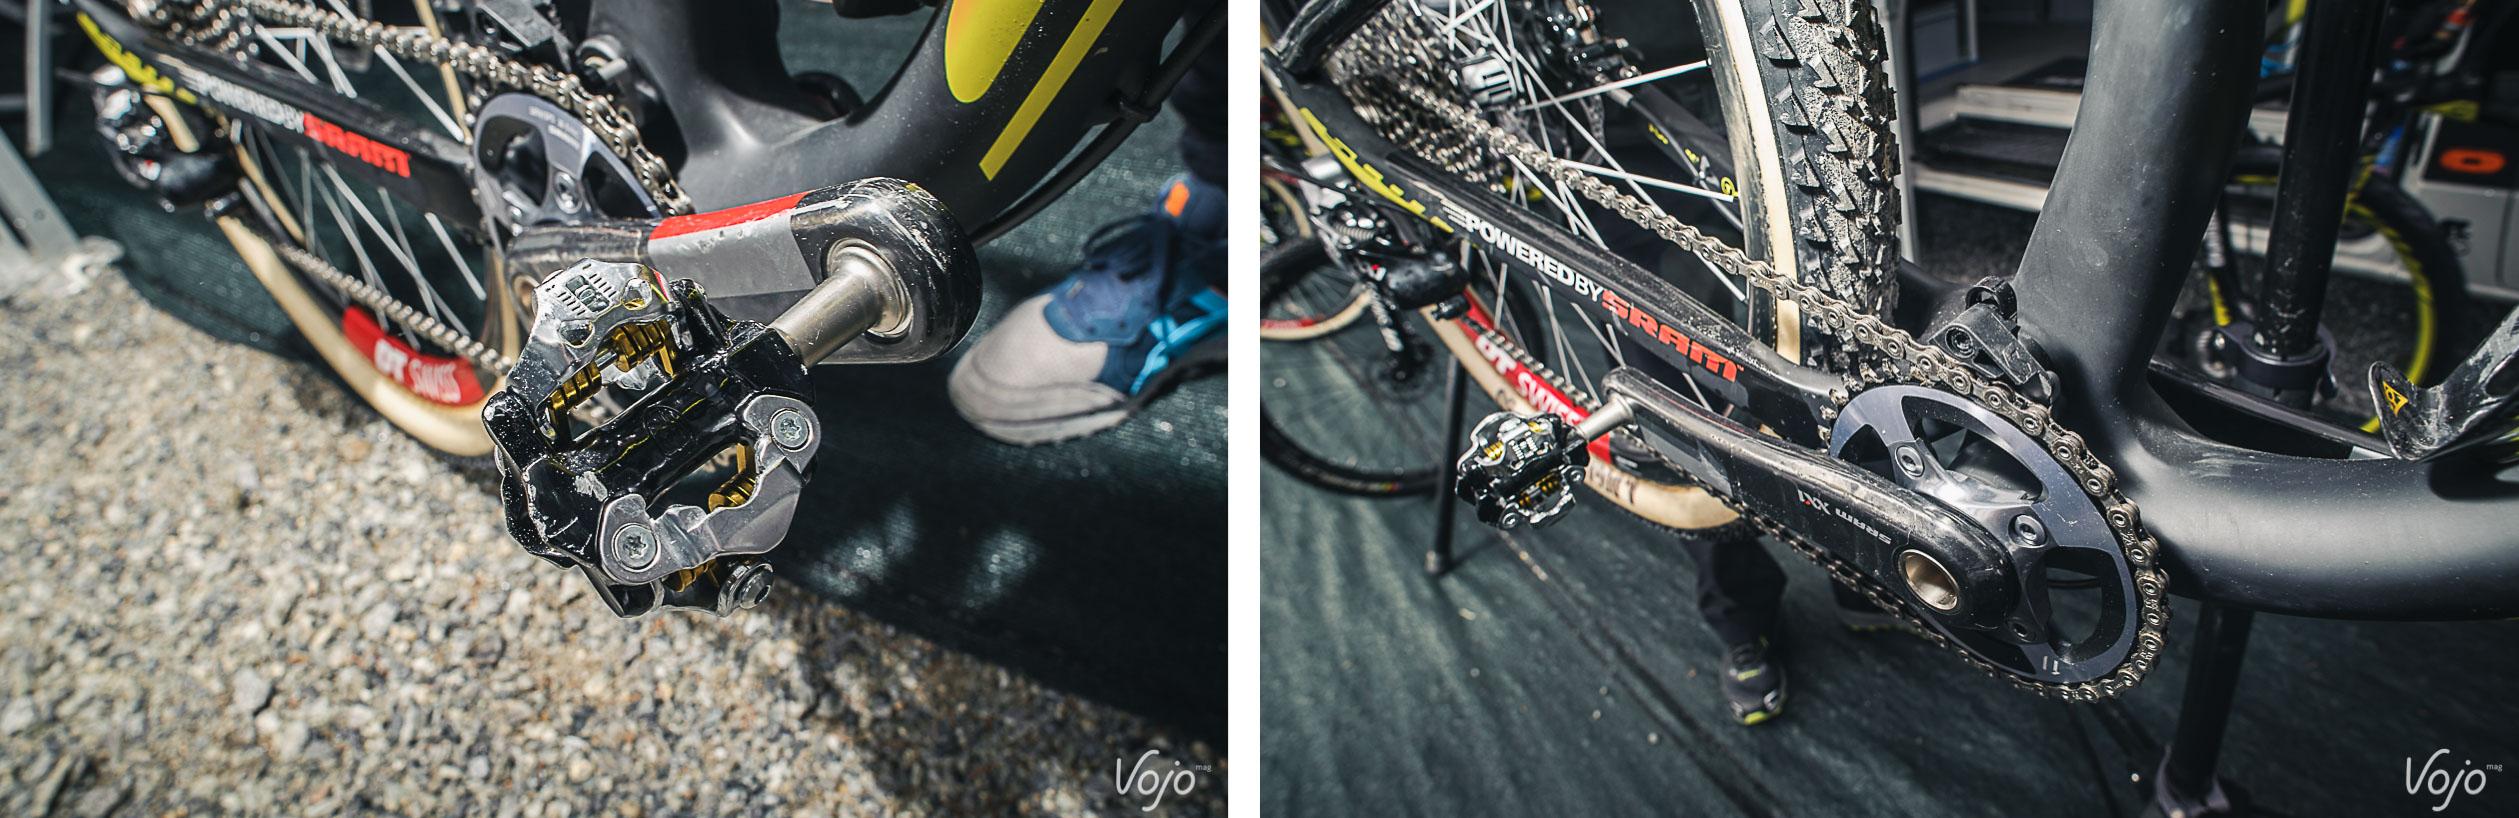 2-World_Cup_MTB_Pro_Bike_Check_Scott_Spark_700_Nino_Schurter_Copyright_OBeart_VojoMag-1